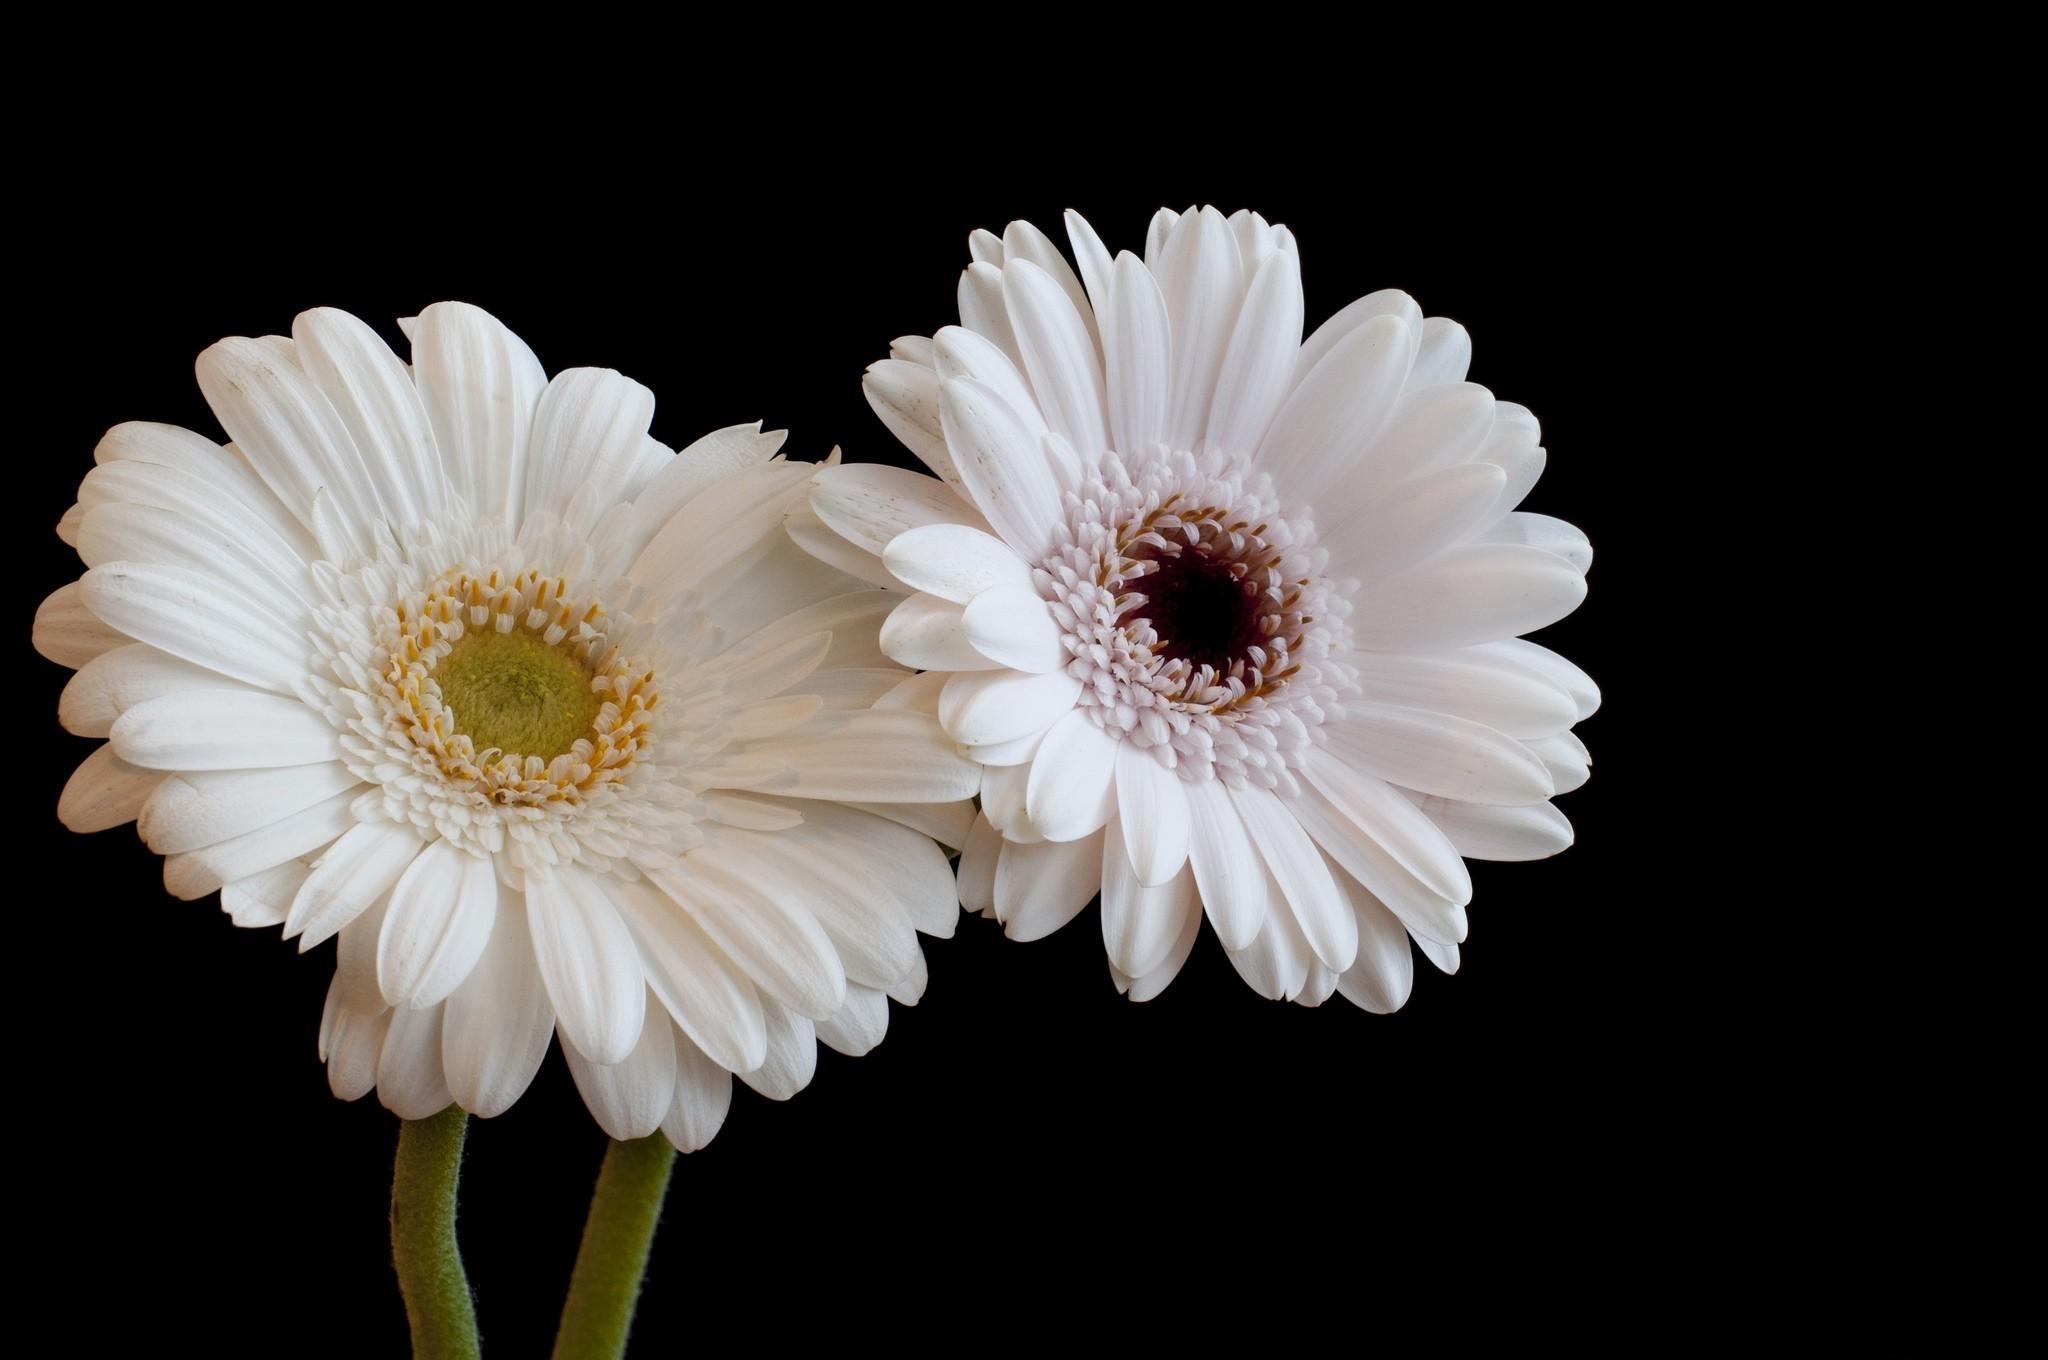 Daisy Flower Black And White Wallpaper 153 Gerbera Fonds d'&#...